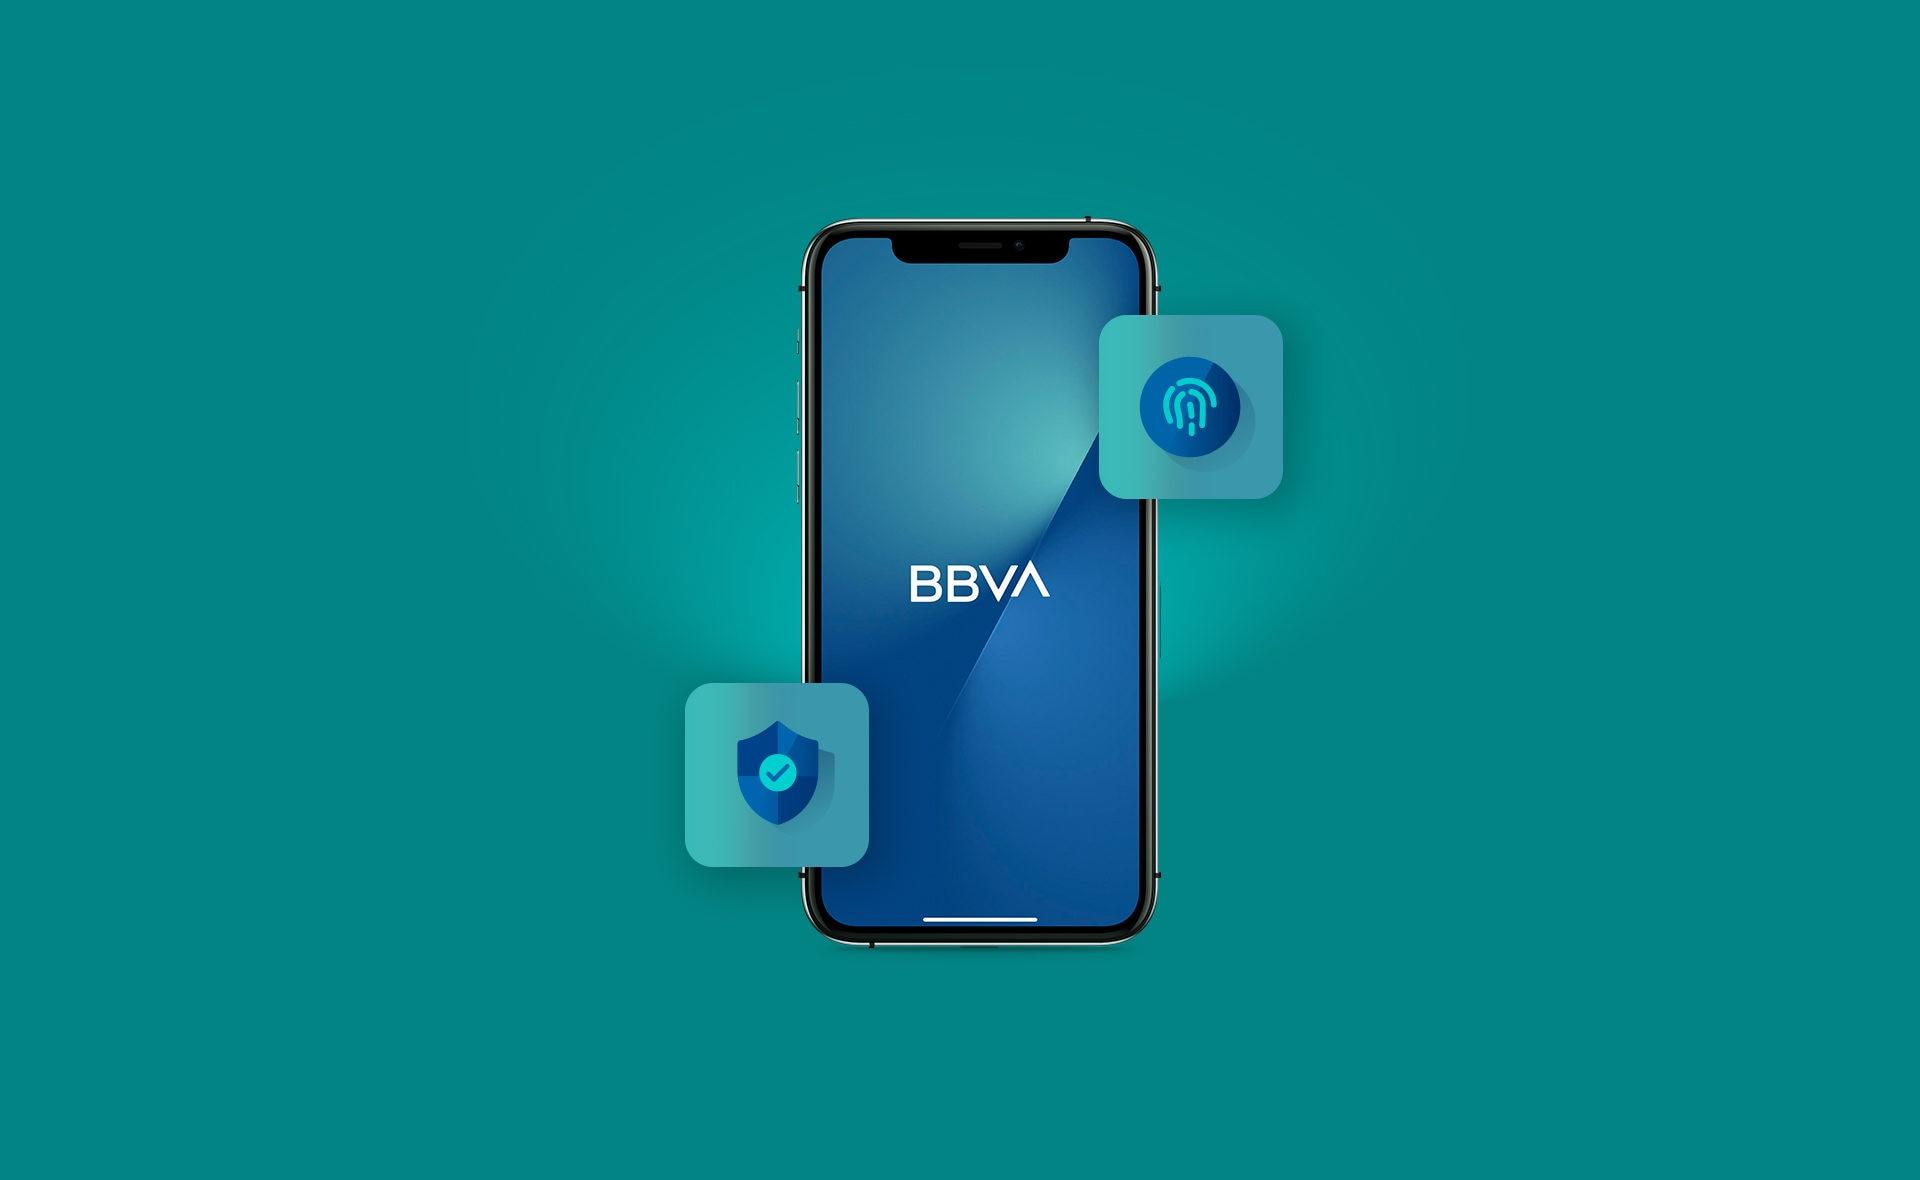 fido-autenticacion-app-bbva-espana